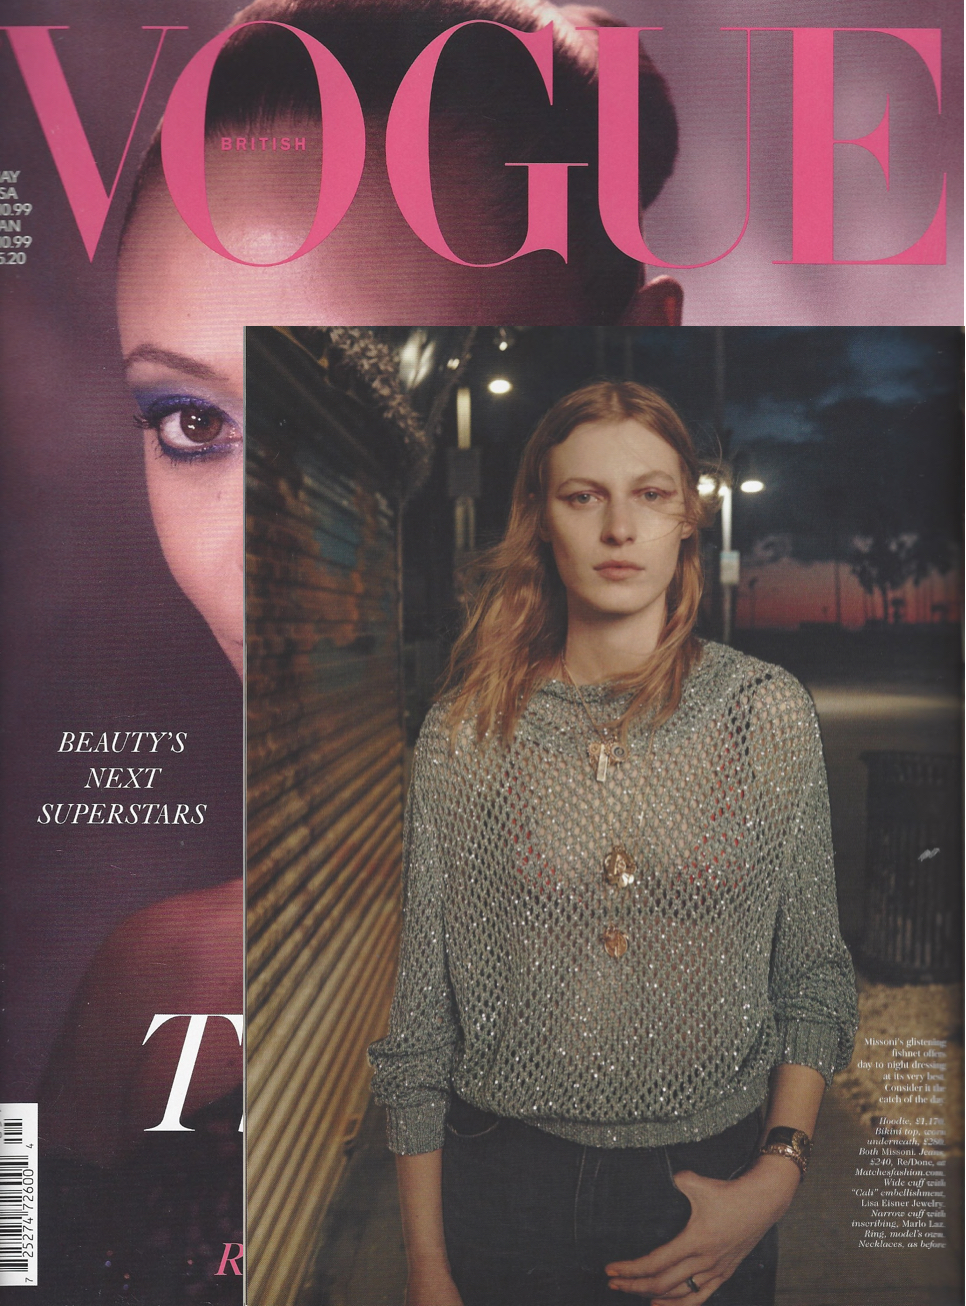 British Vogue May 2021